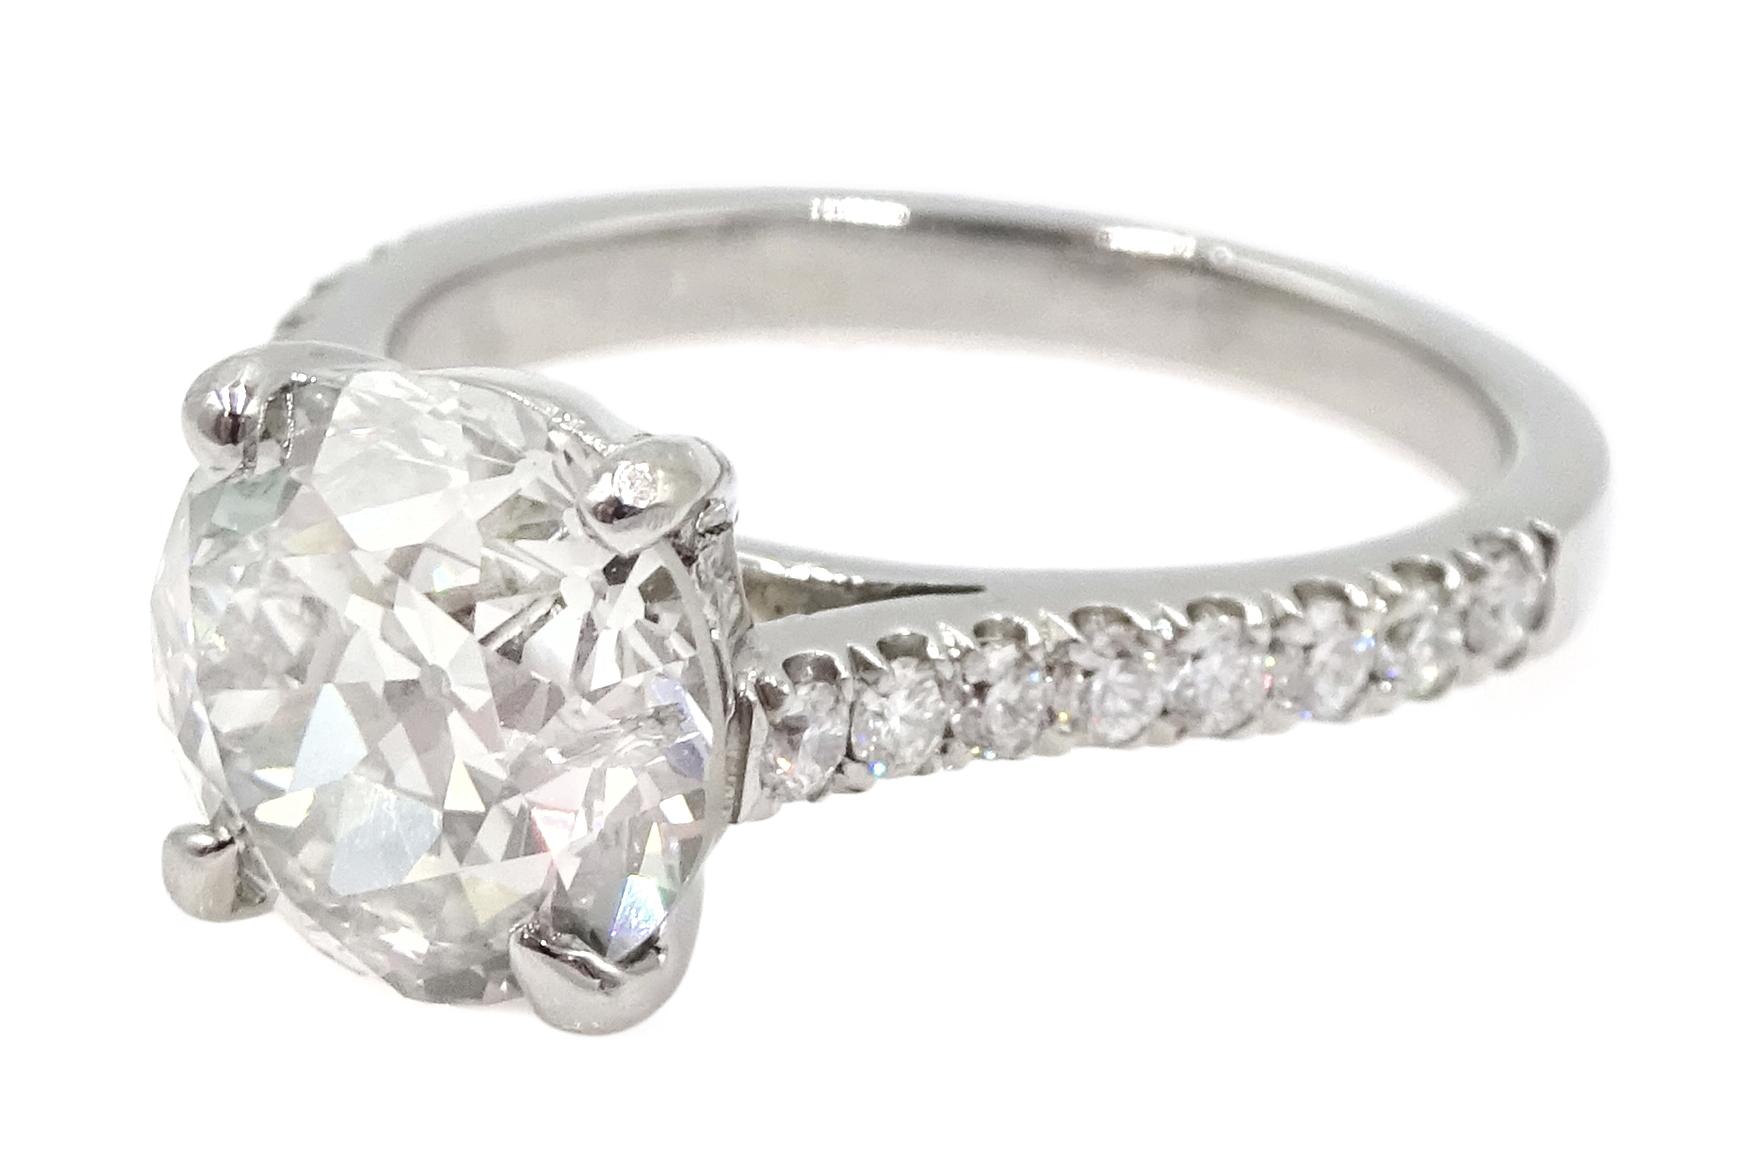 Platinum old cut diamond solitaire ring - Image 4 of 9